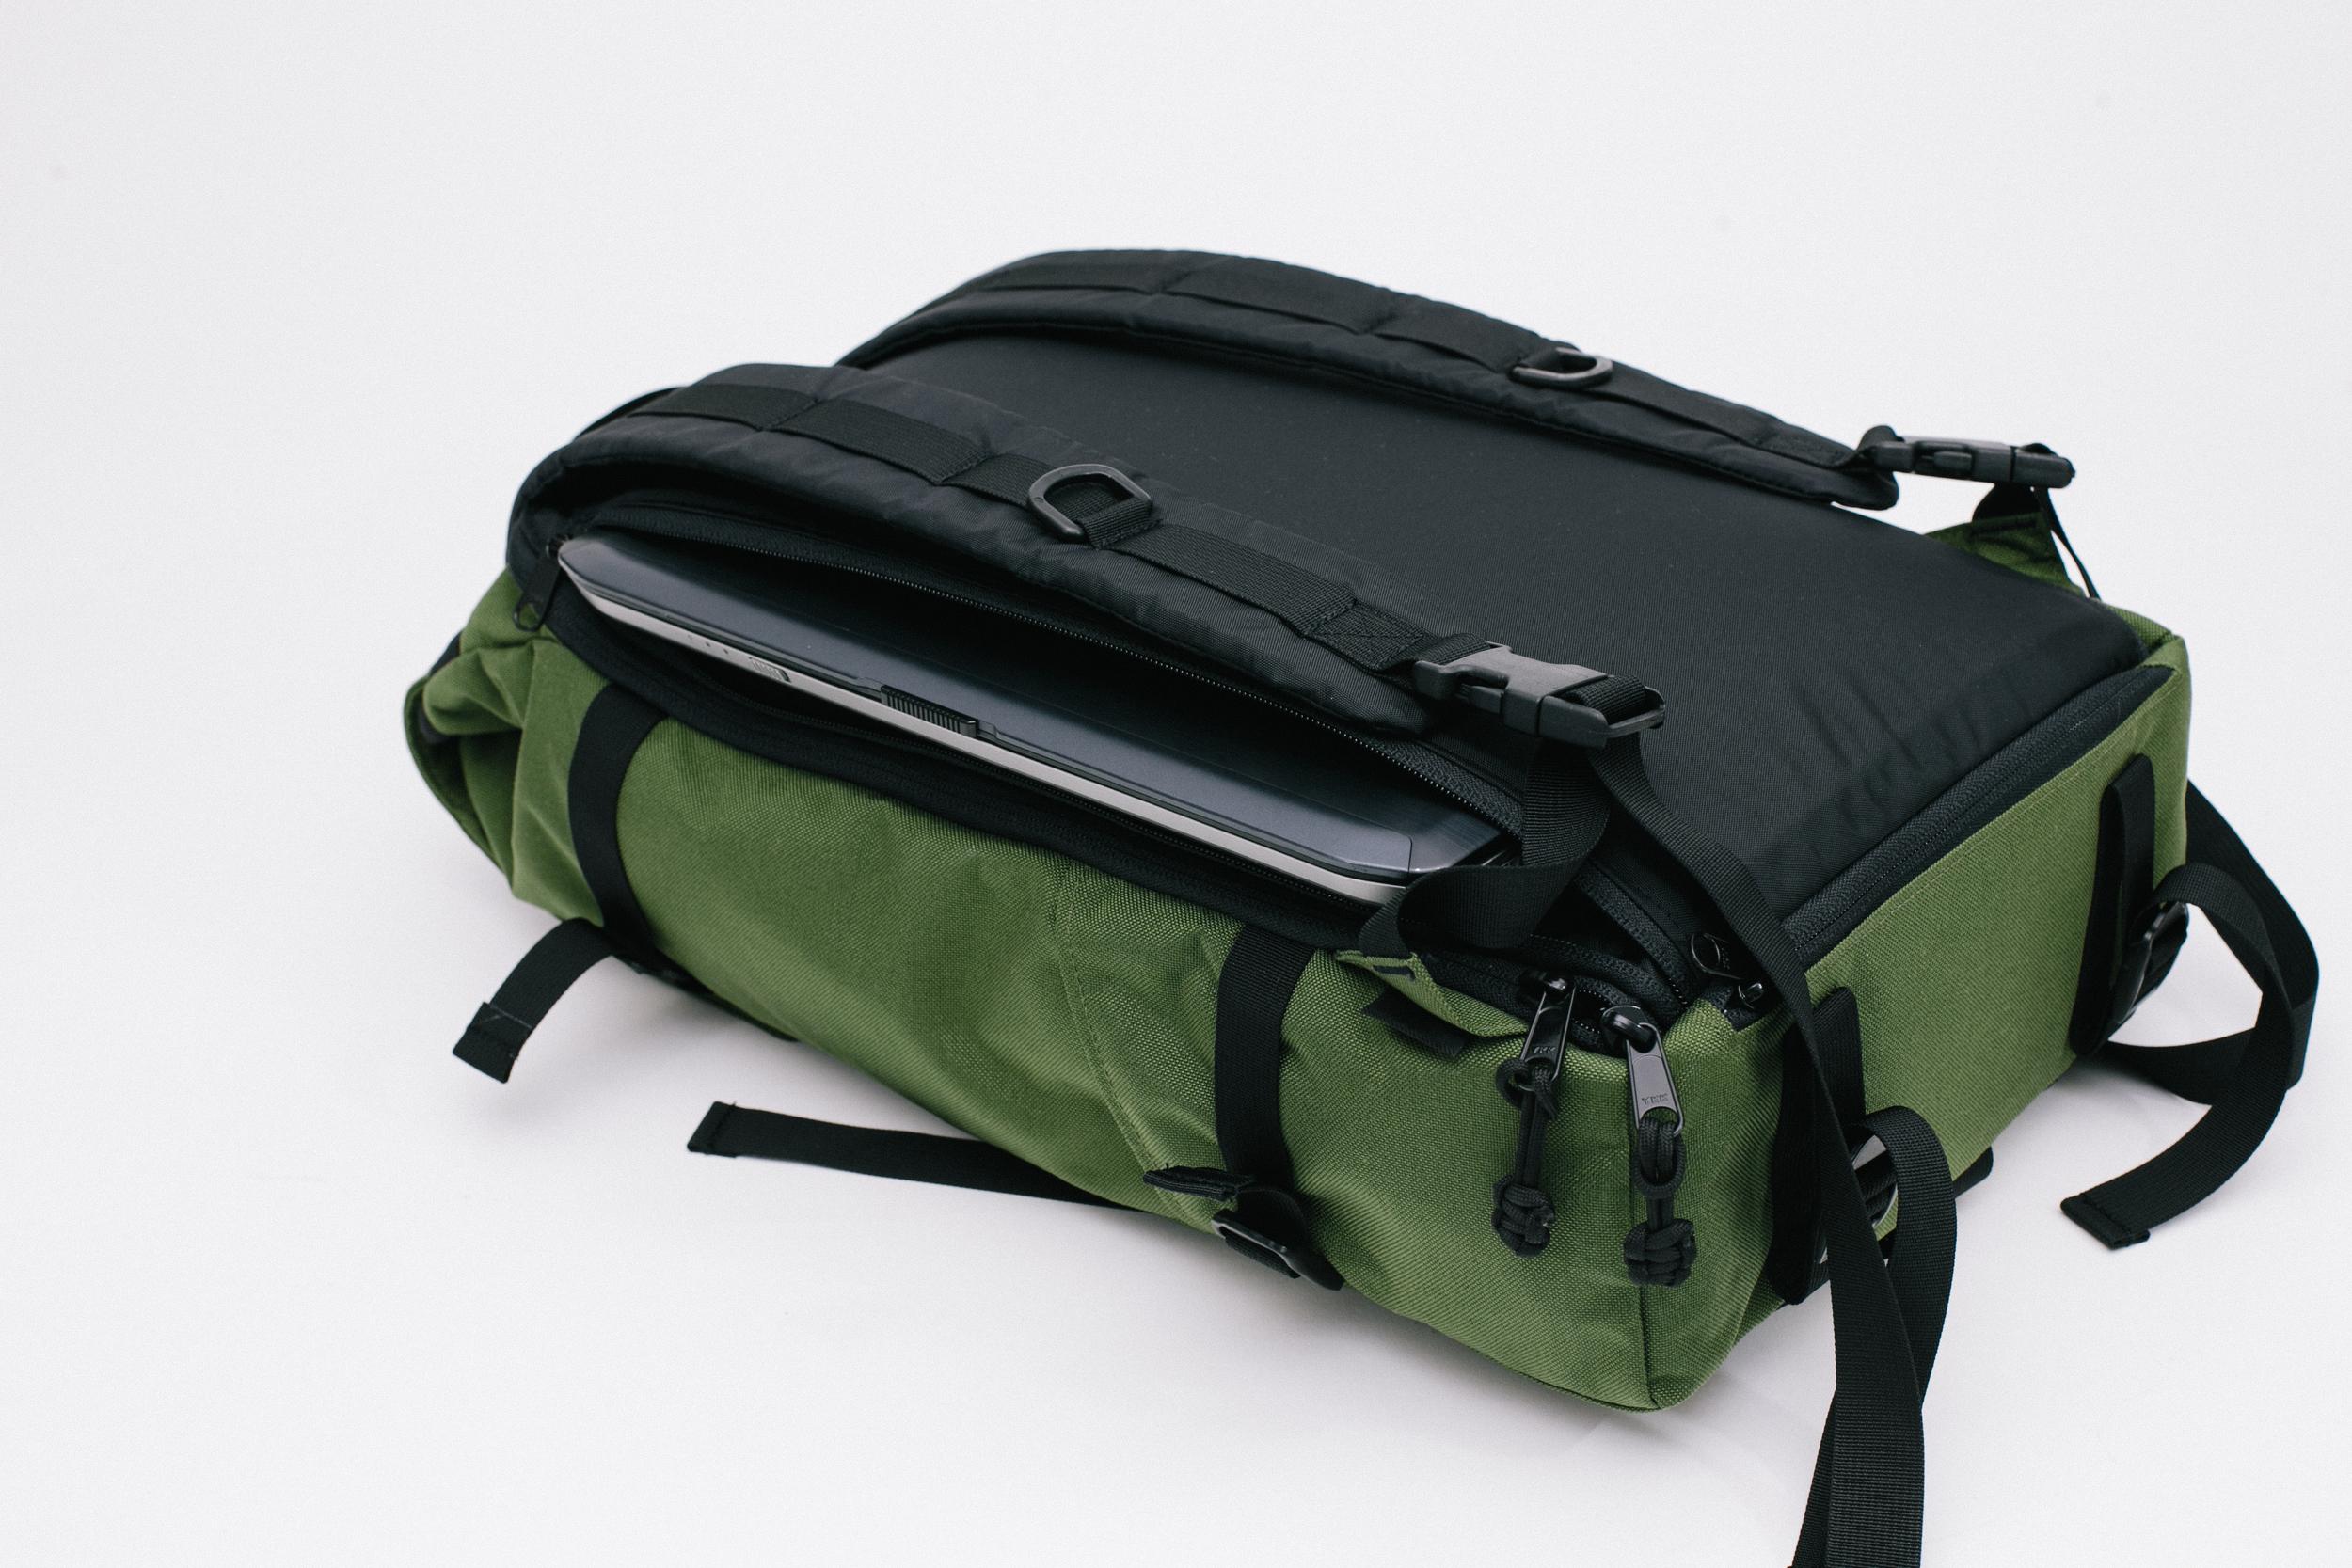 TSA-friendly external laptop compartment for easy access